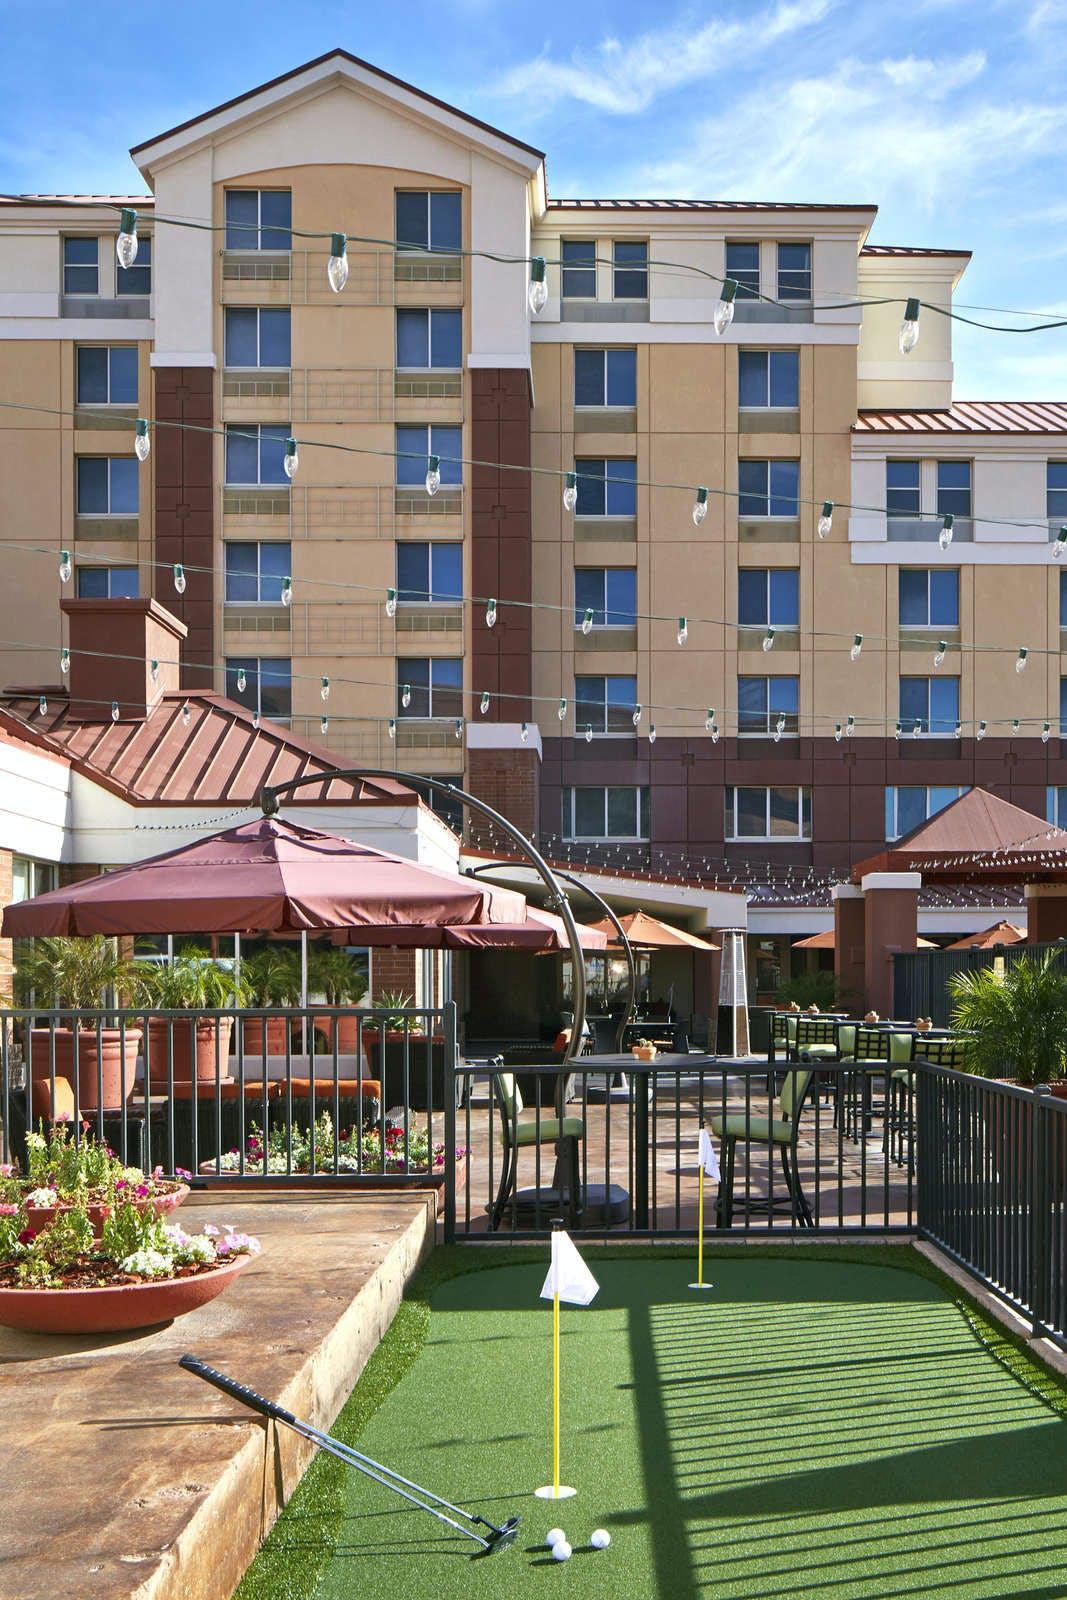 Hilton Garden Inn Old Town